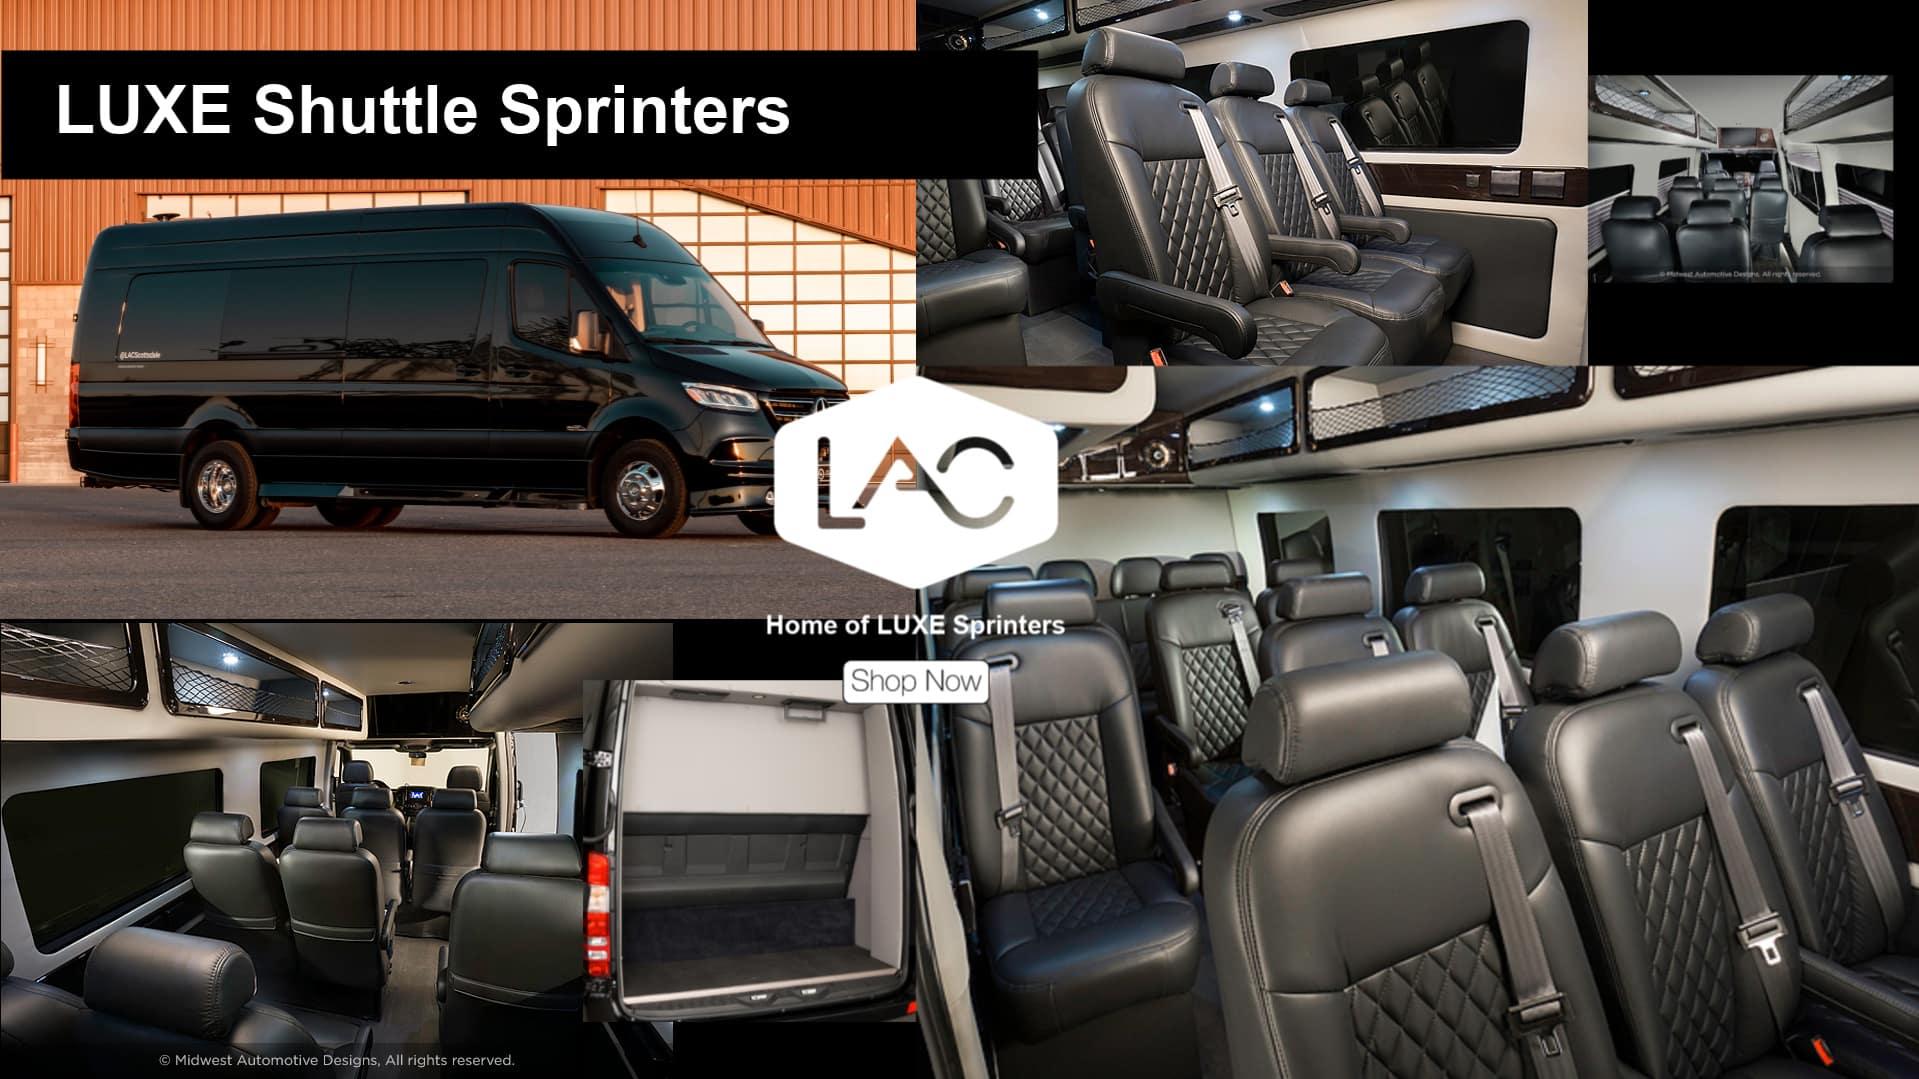 LUXE Shuttle Sprinters